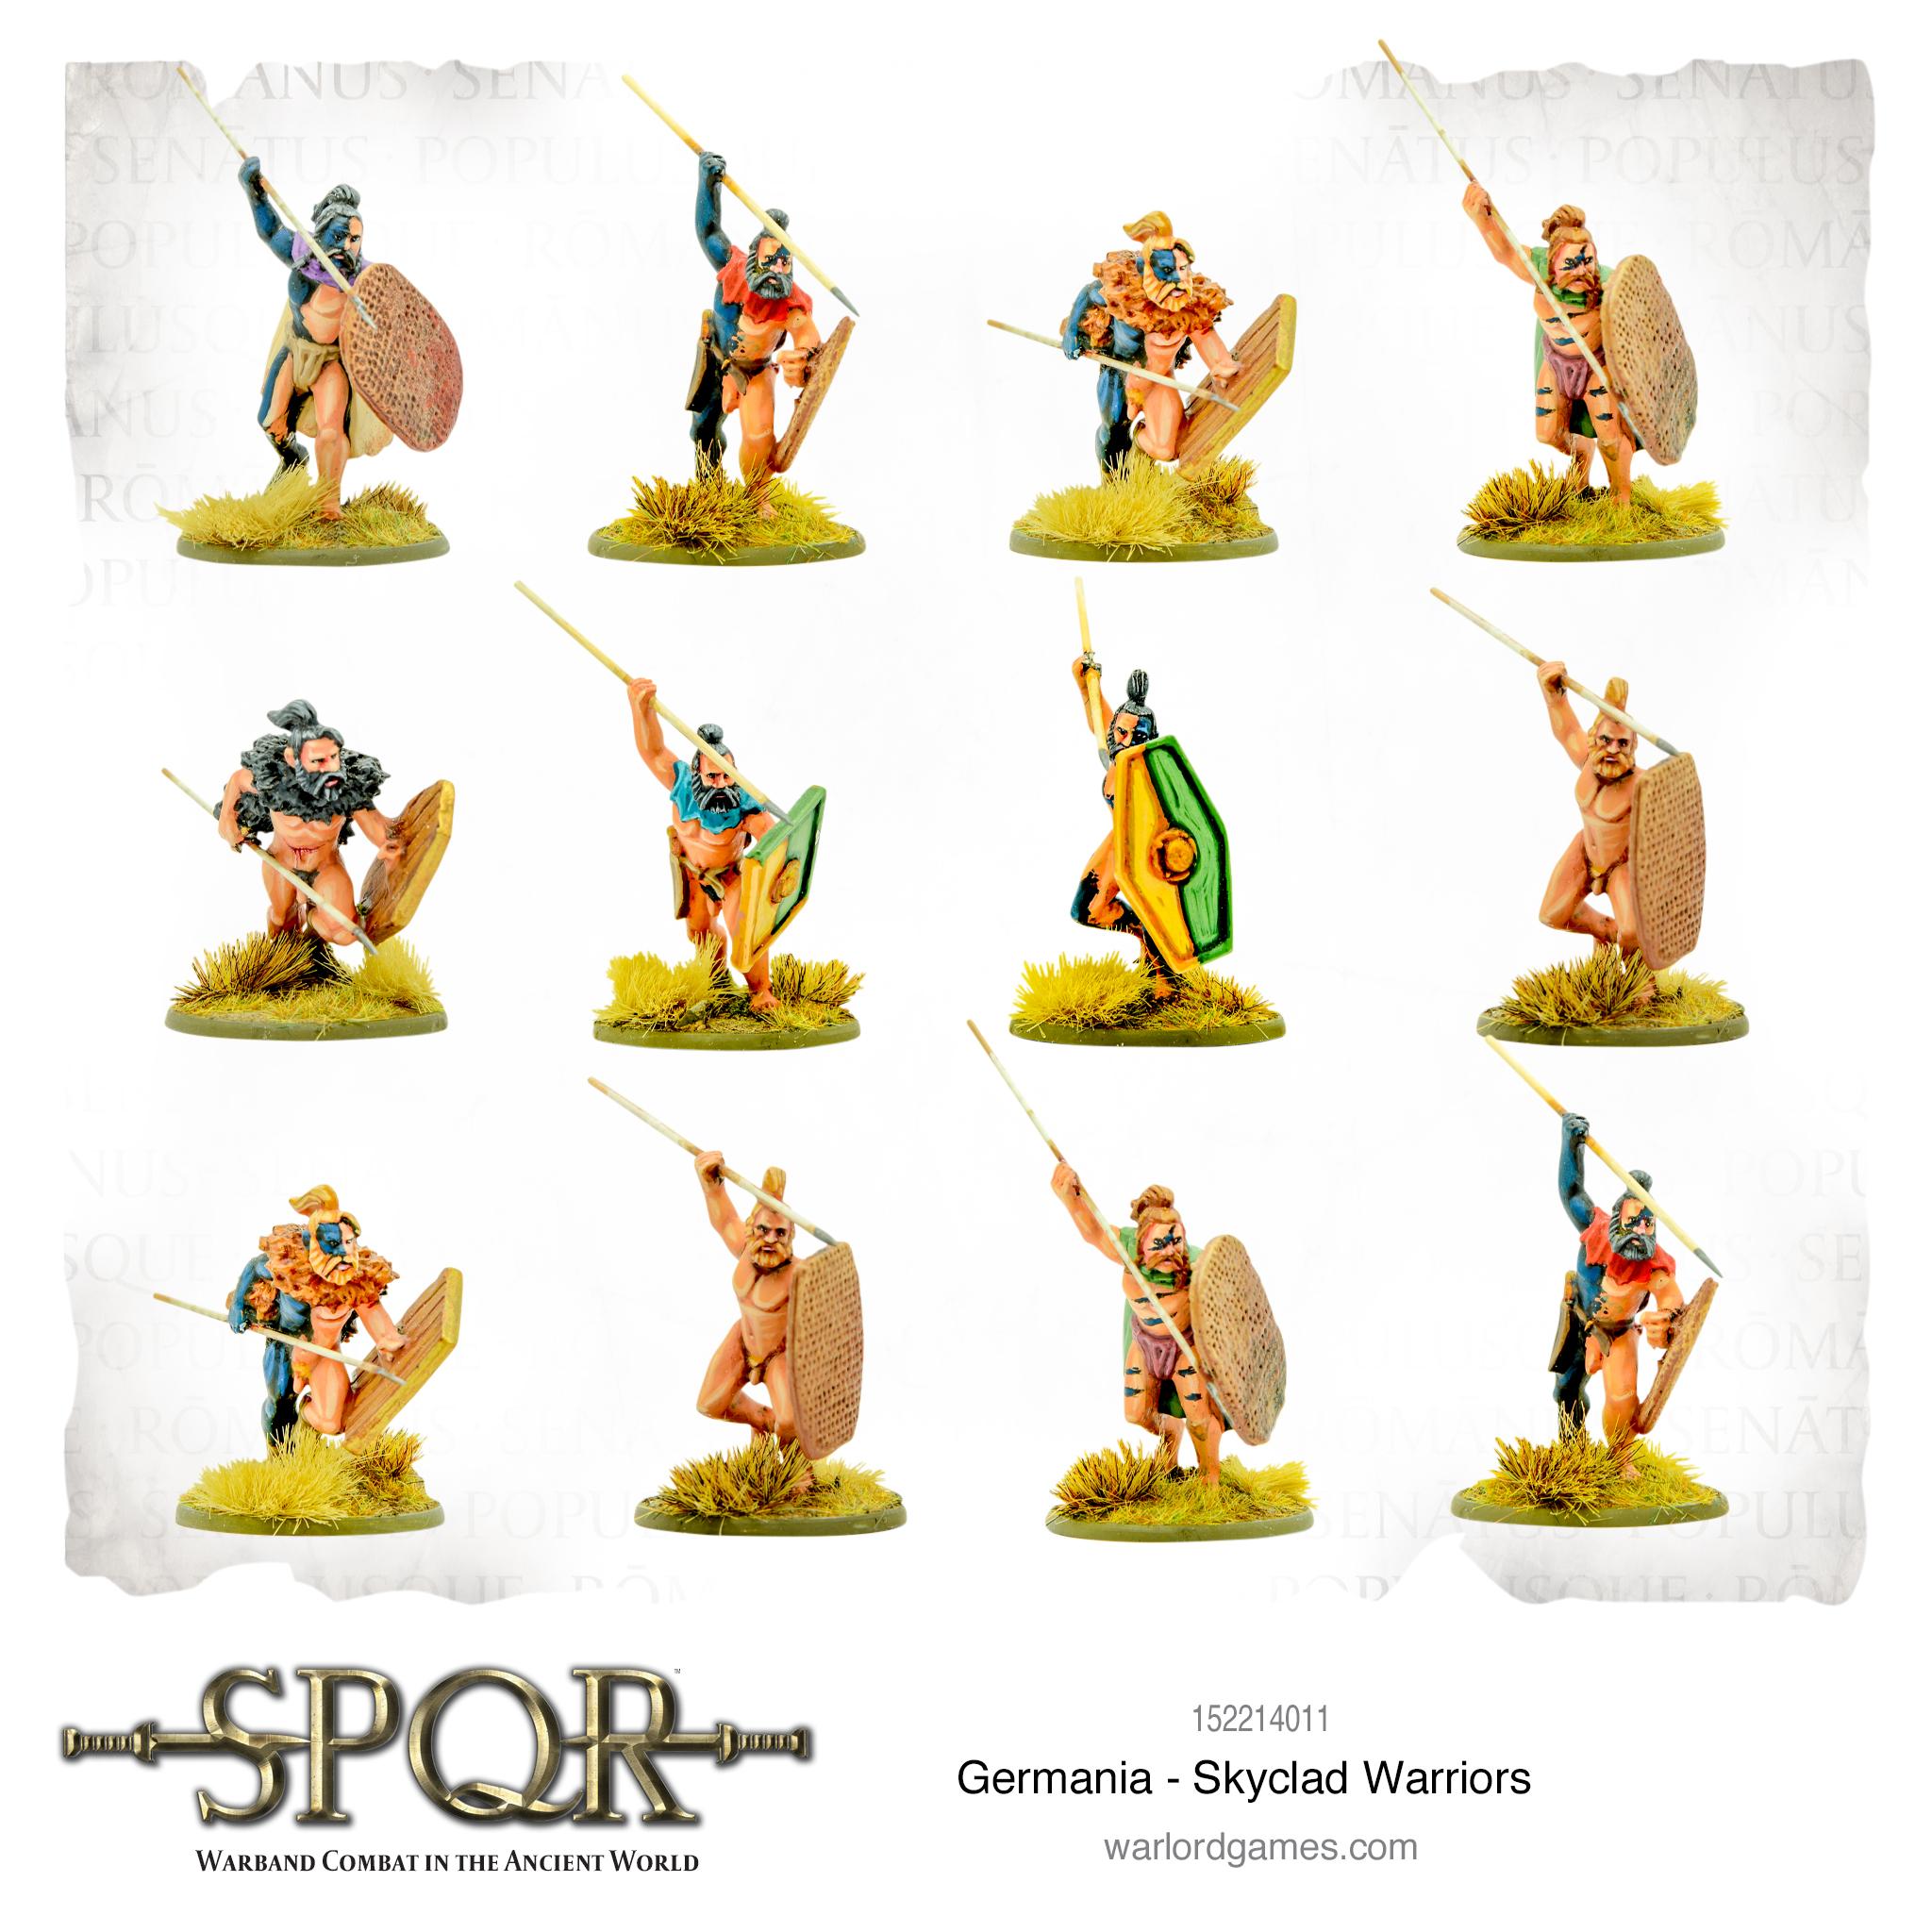 SPQR: Germania - Skyclad Warriors